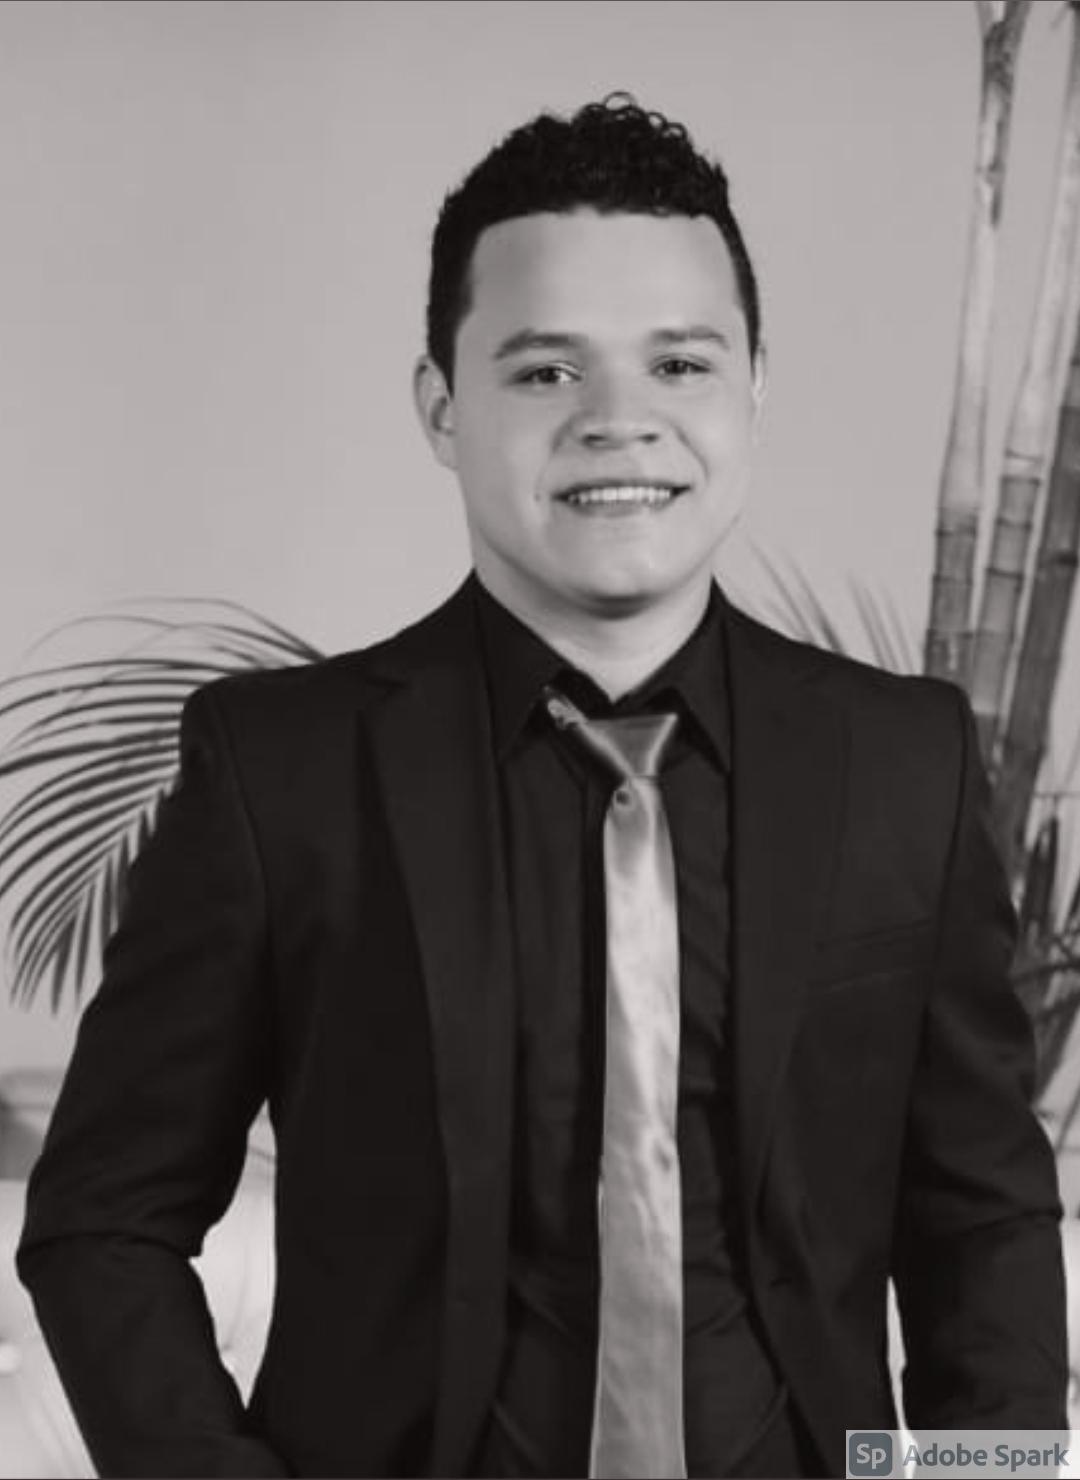 Francisco Patrik C. Gomes